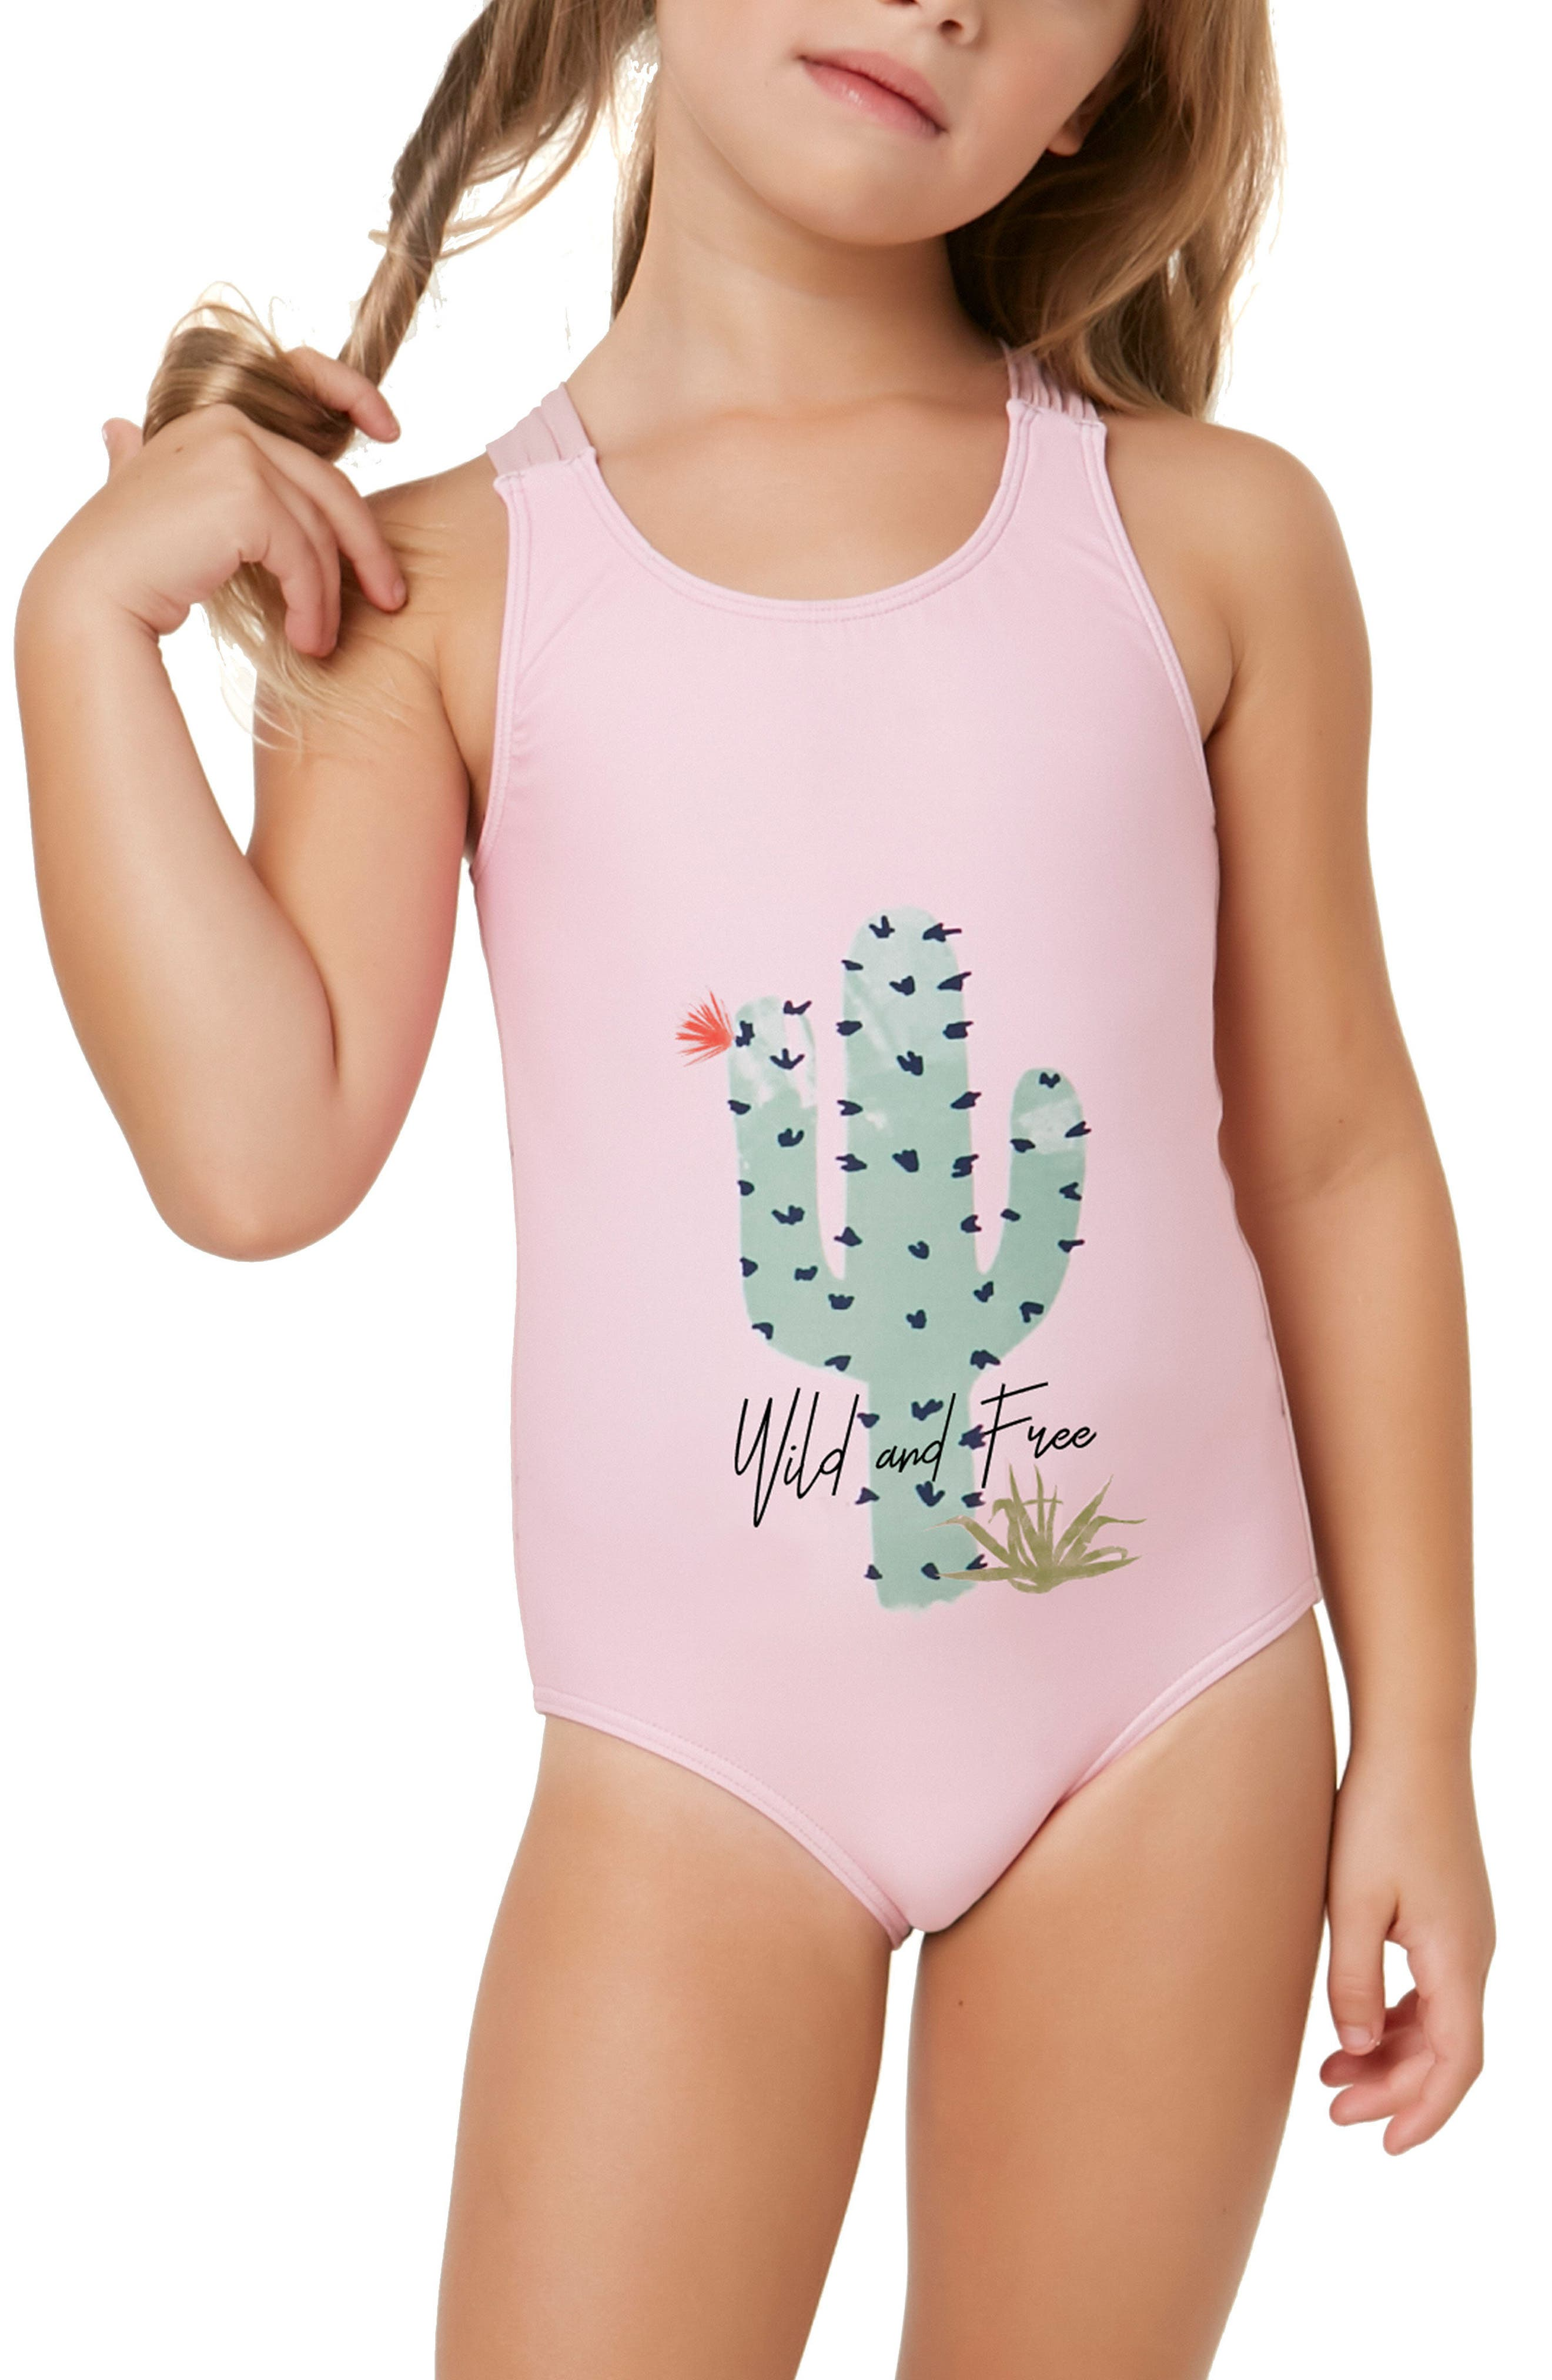 Cacti One-Piece Swimsuit,                             Alternate thumbnail 4, color,                             650